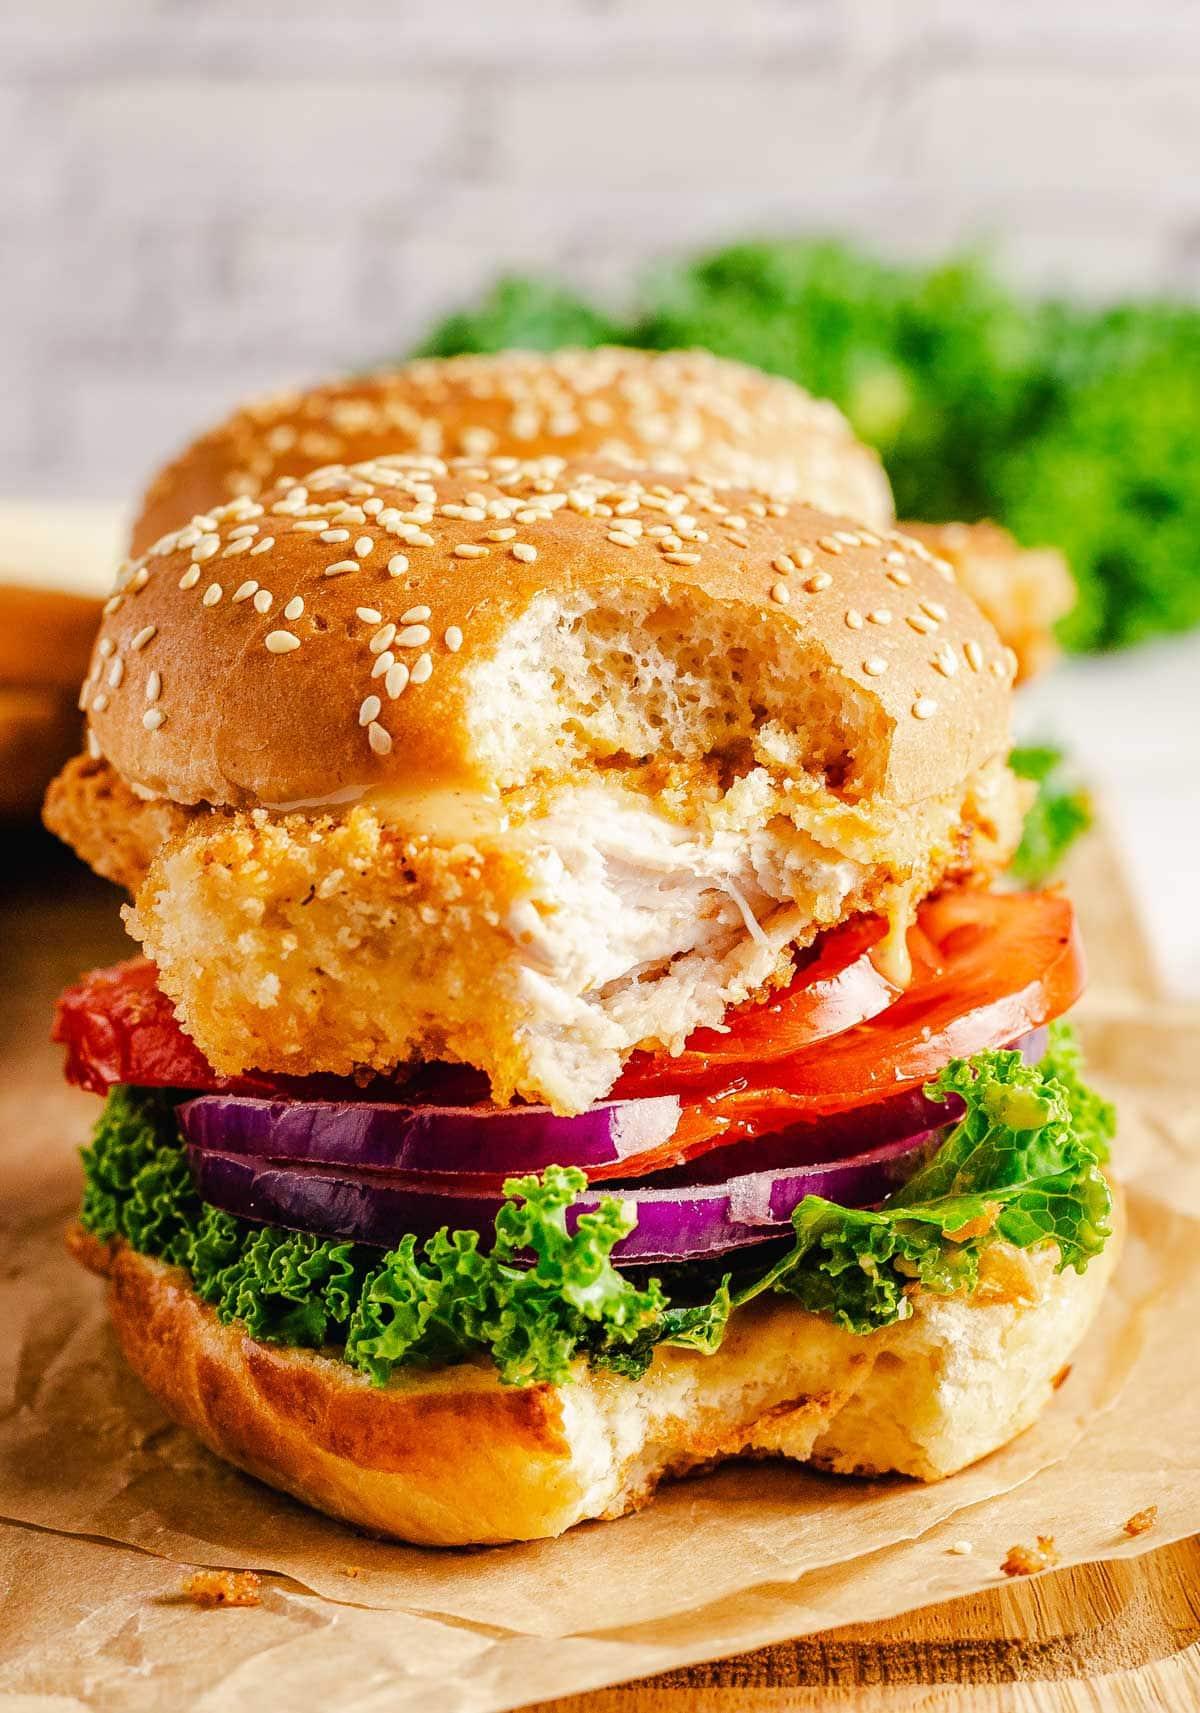 chicken sandwich with a big bite taken sitting on a brown parchment paper.